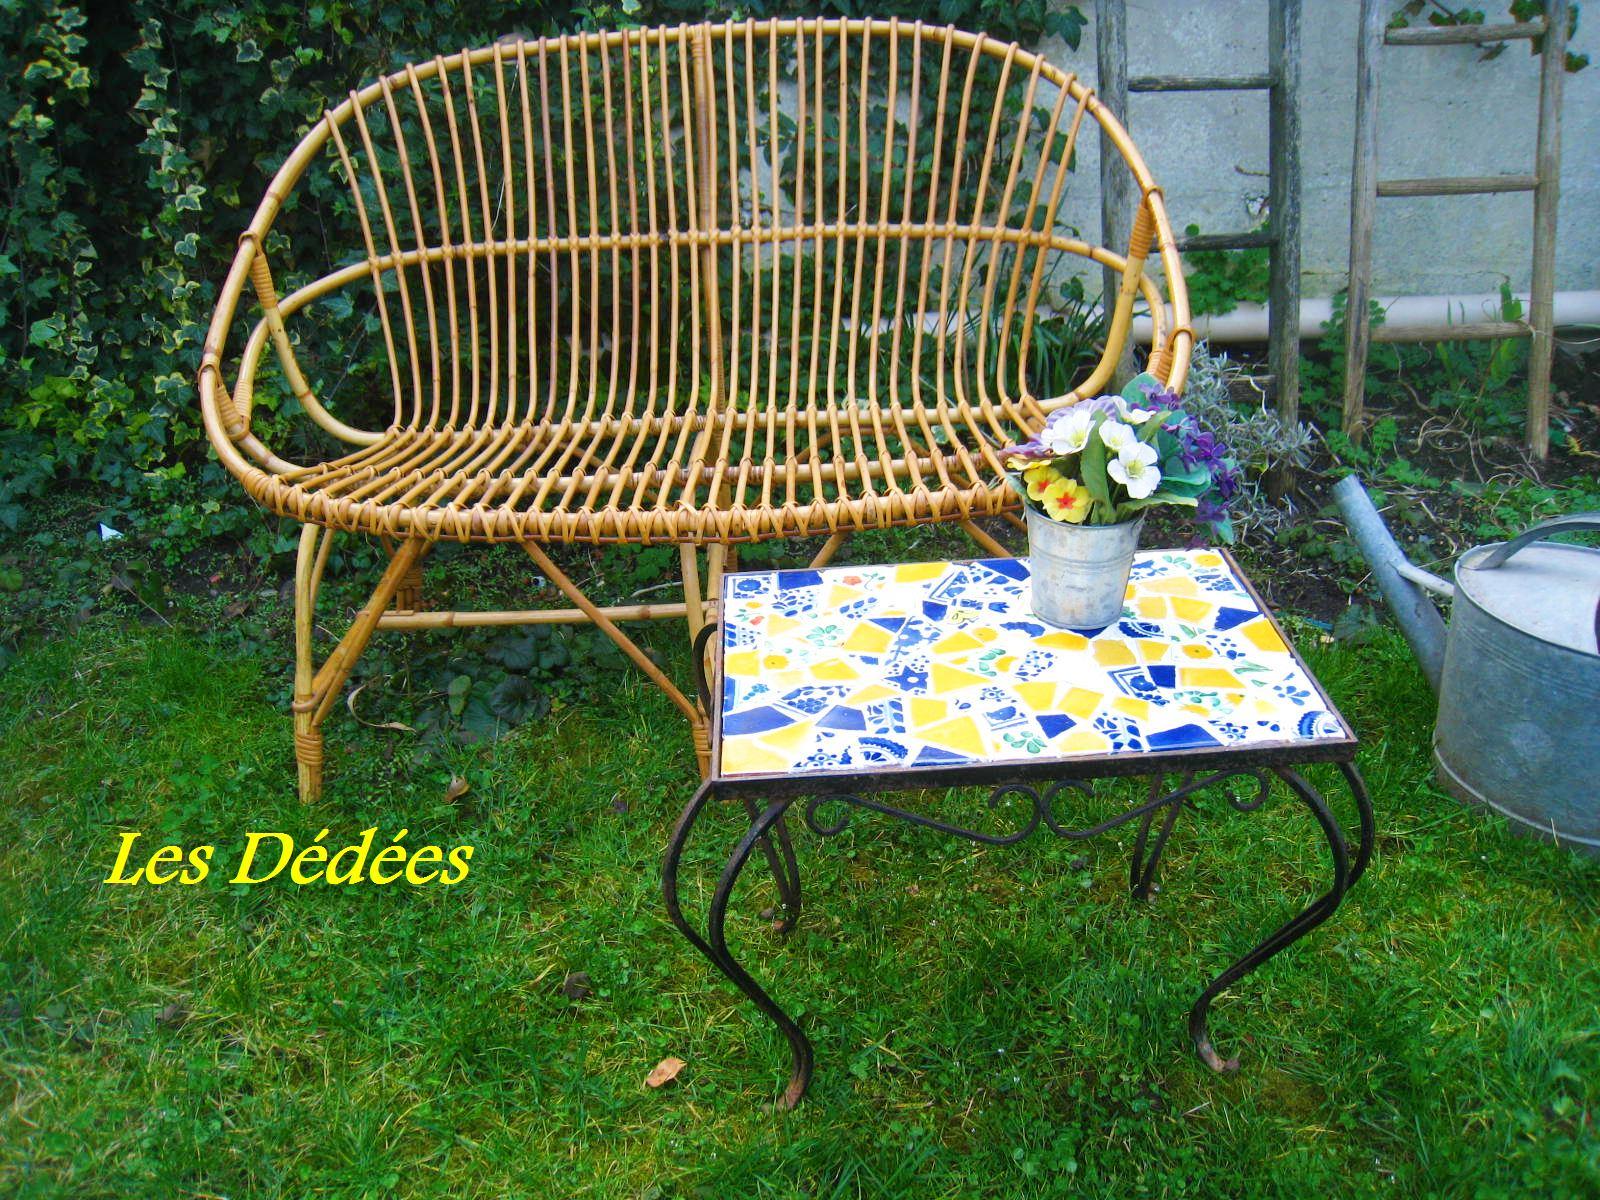 Les dedees vintage recup creations TABLE BASSE AU CARACTERE